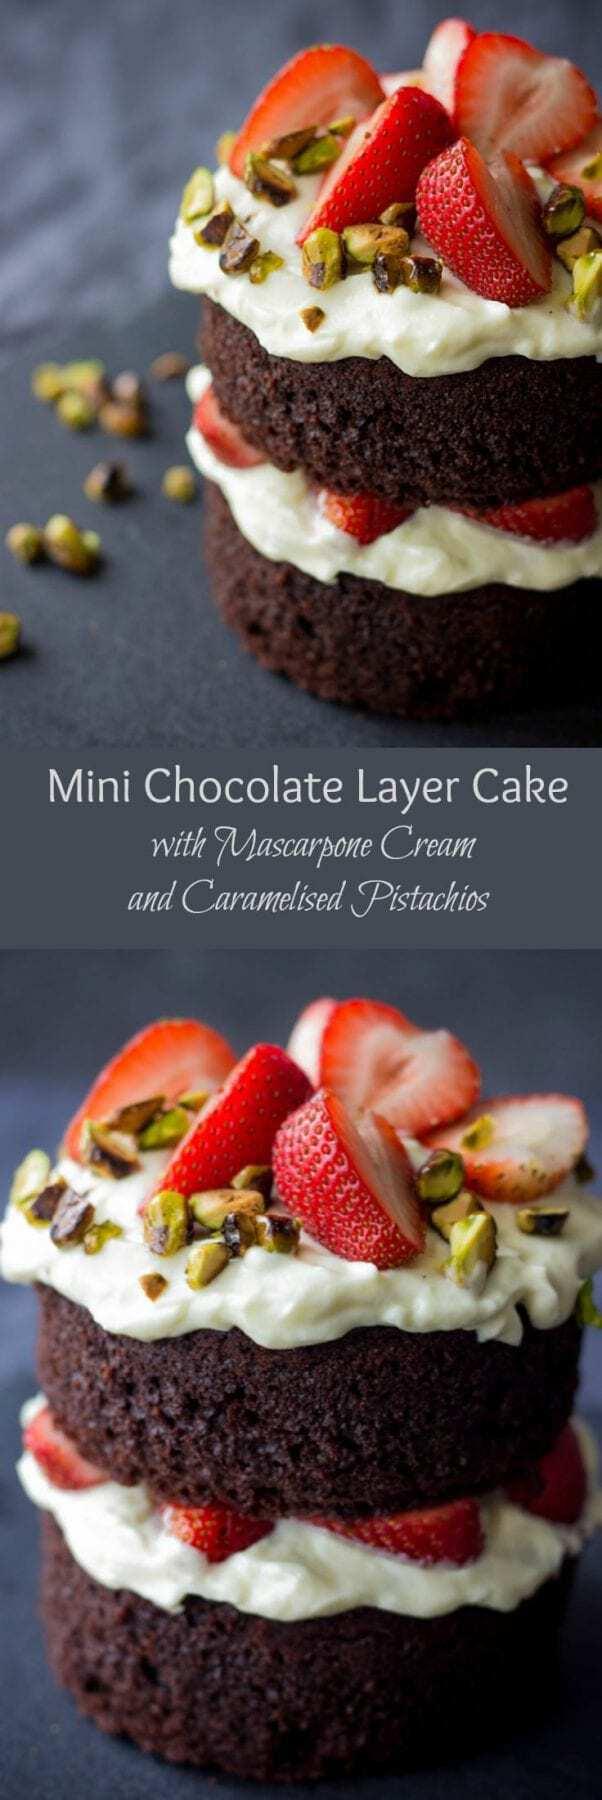 Small Chocolate Layer Cake